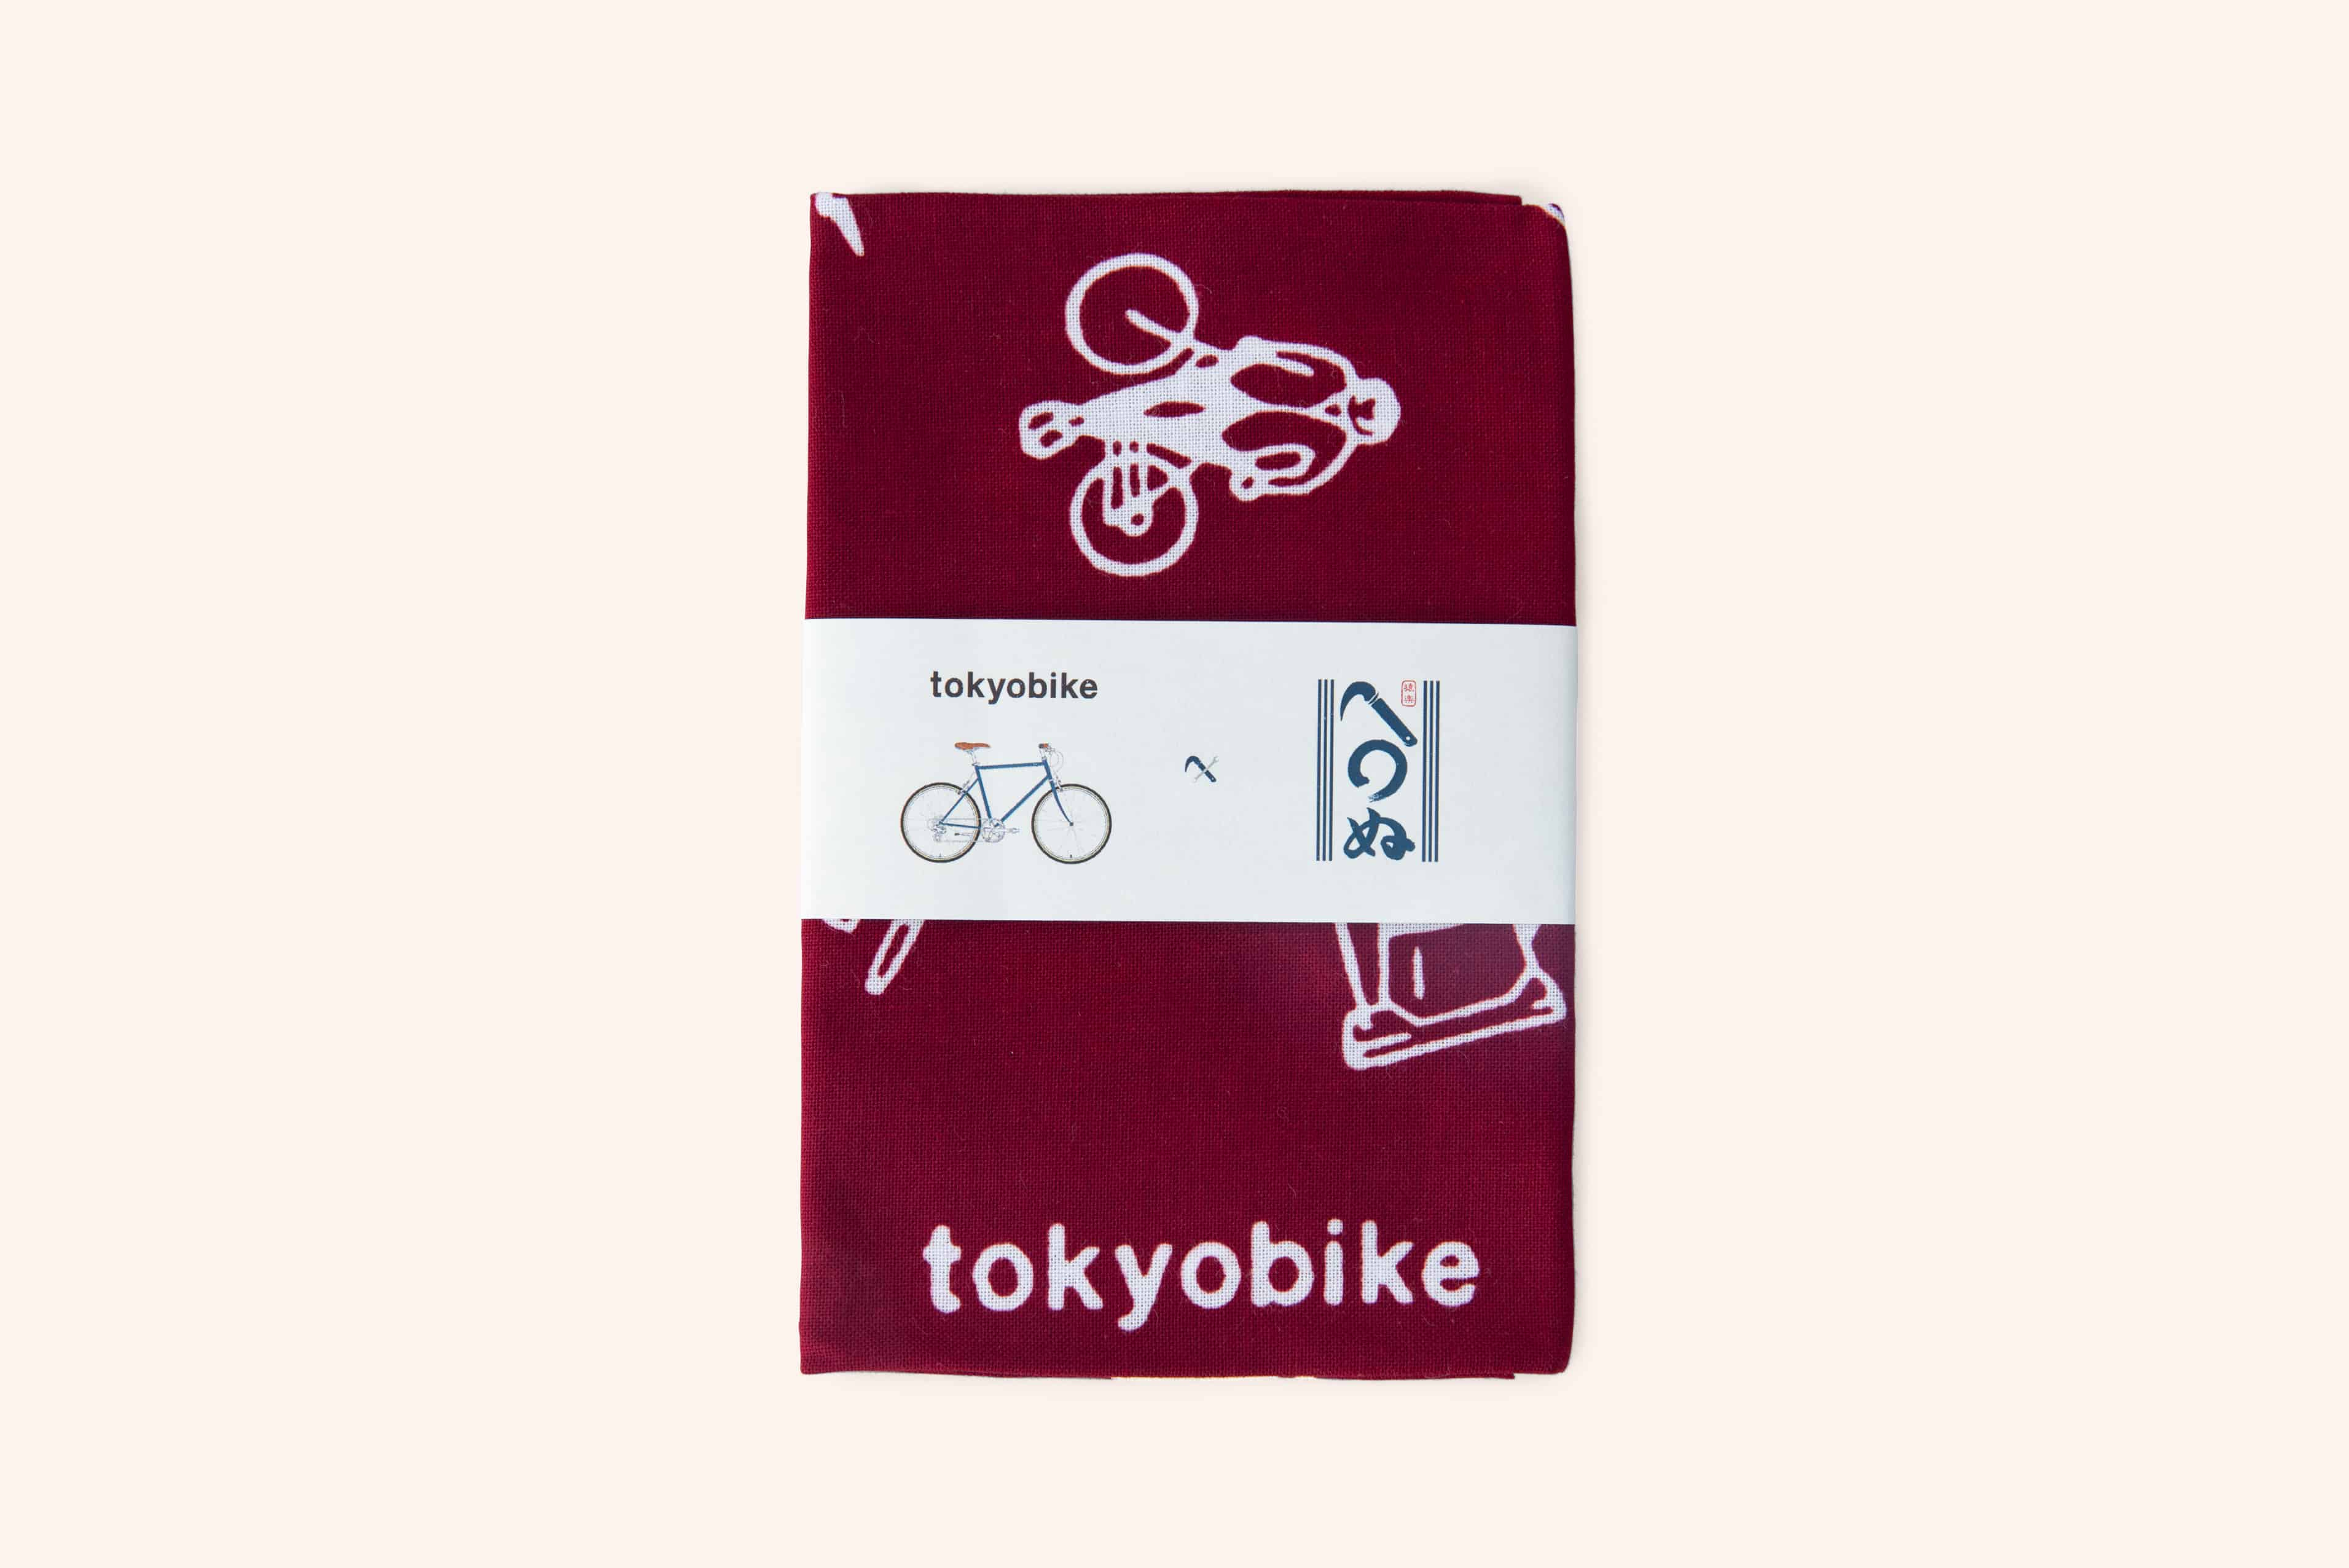 tokyobike TOKYOBIKE かまわぬ